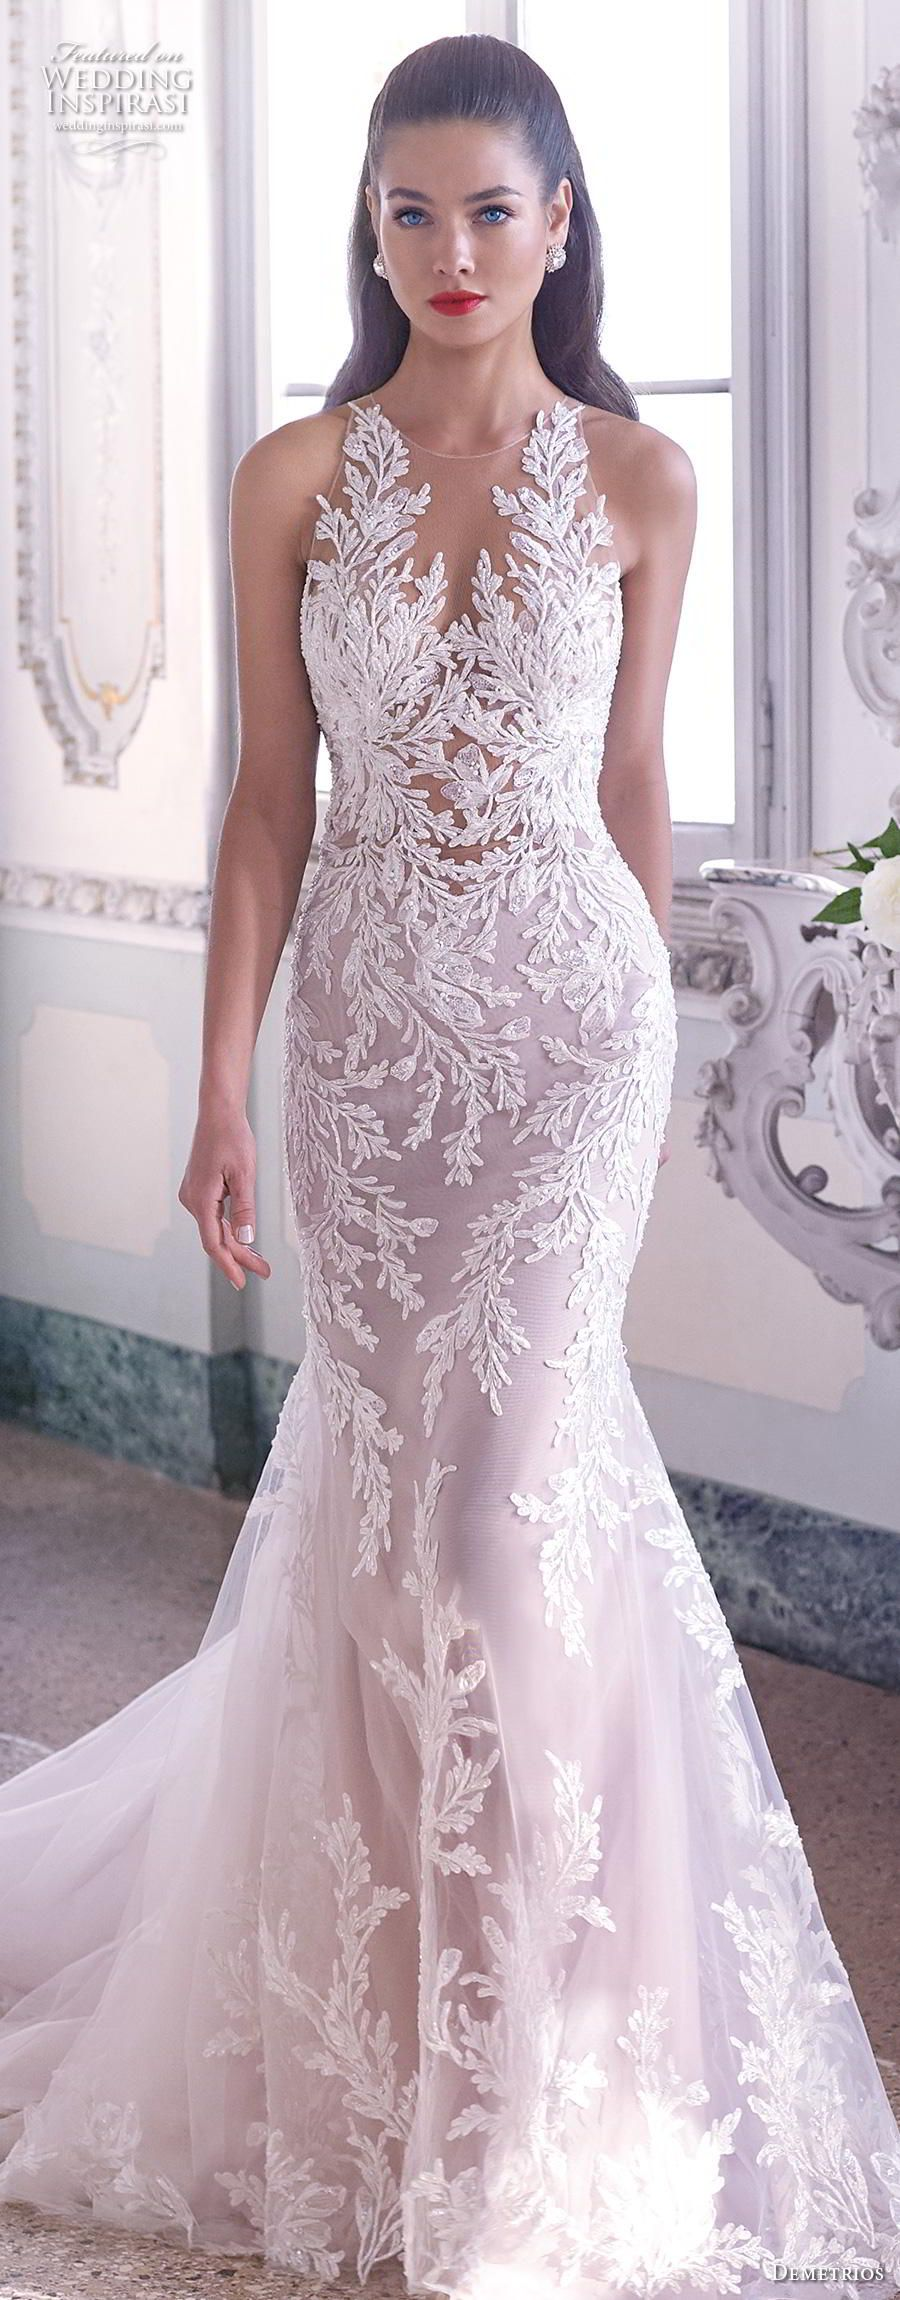 Platinum by demetrios wedding dresses in vestidos